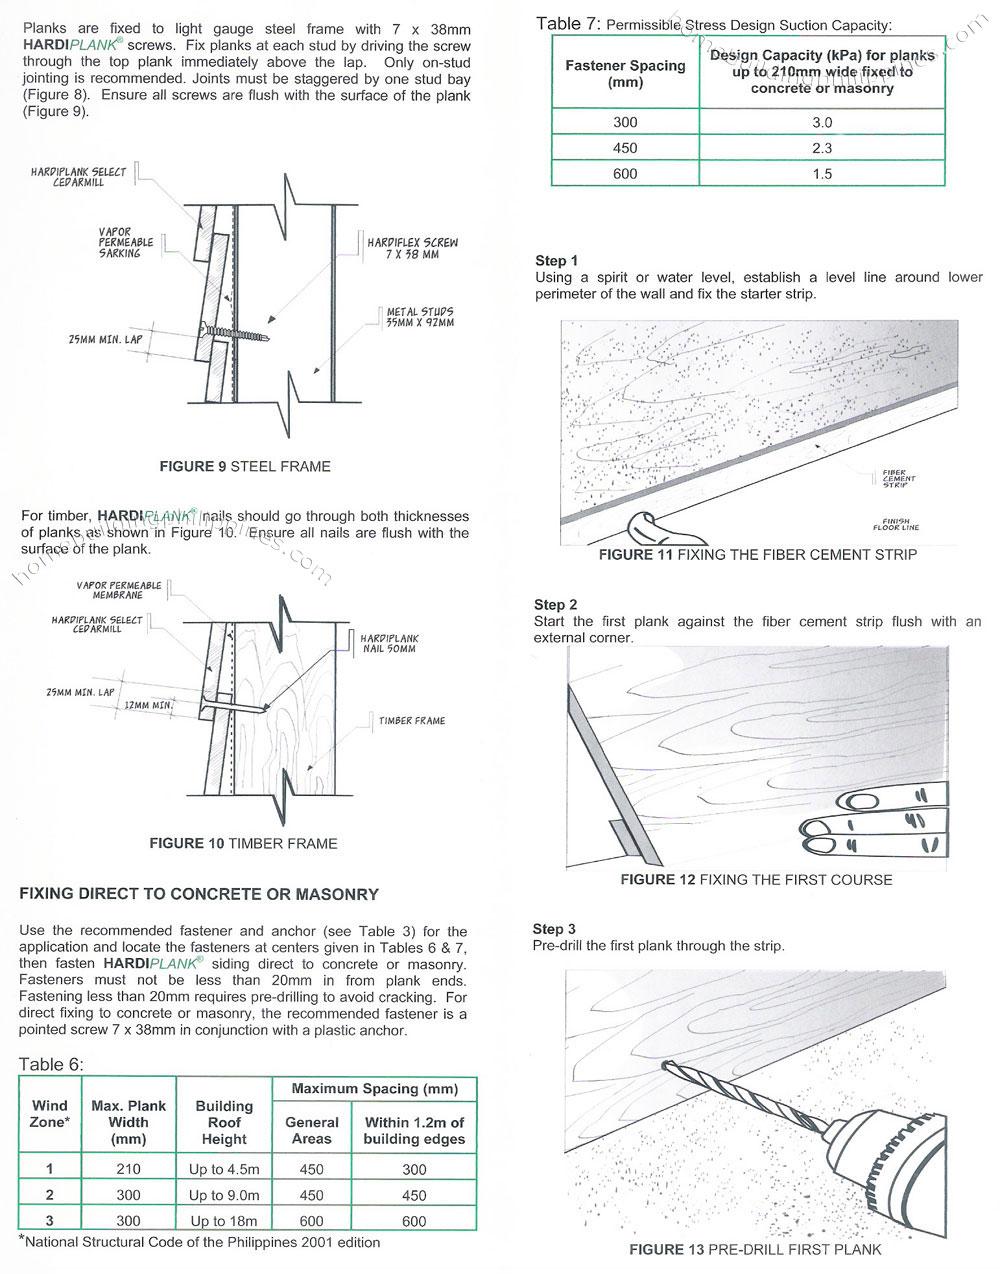 HardiePlank Durable Siding Board Installation Philippines